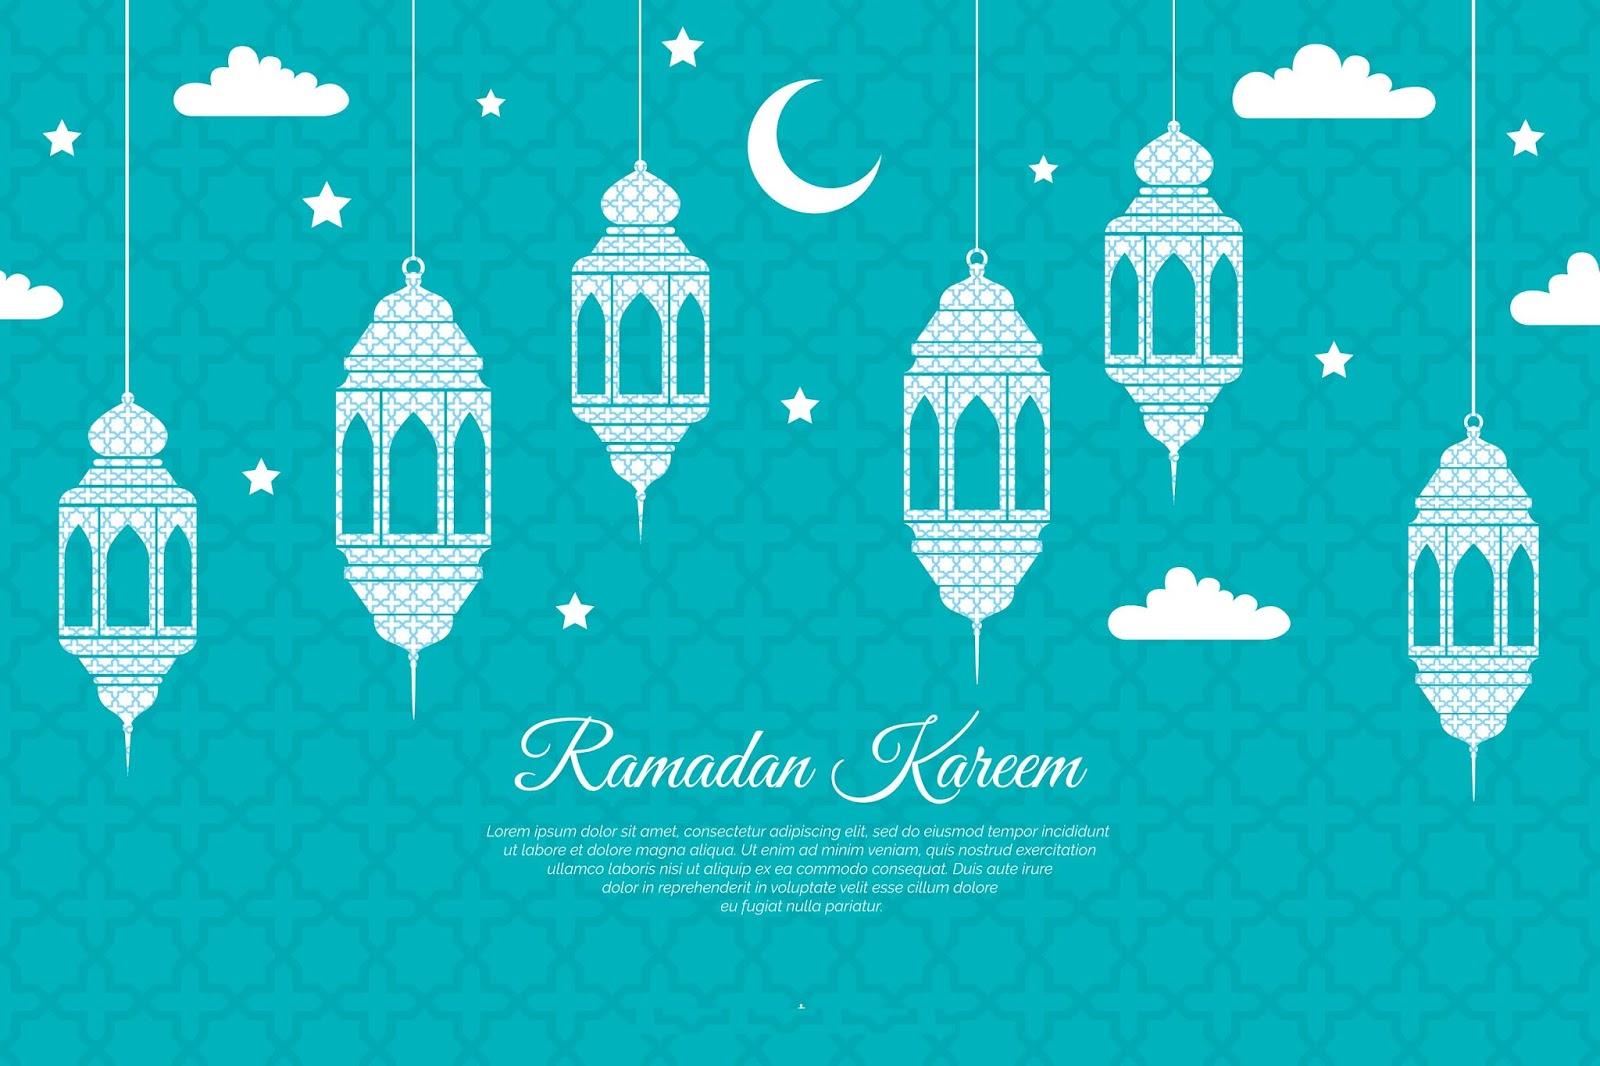 Ramadan-Kareem-Images